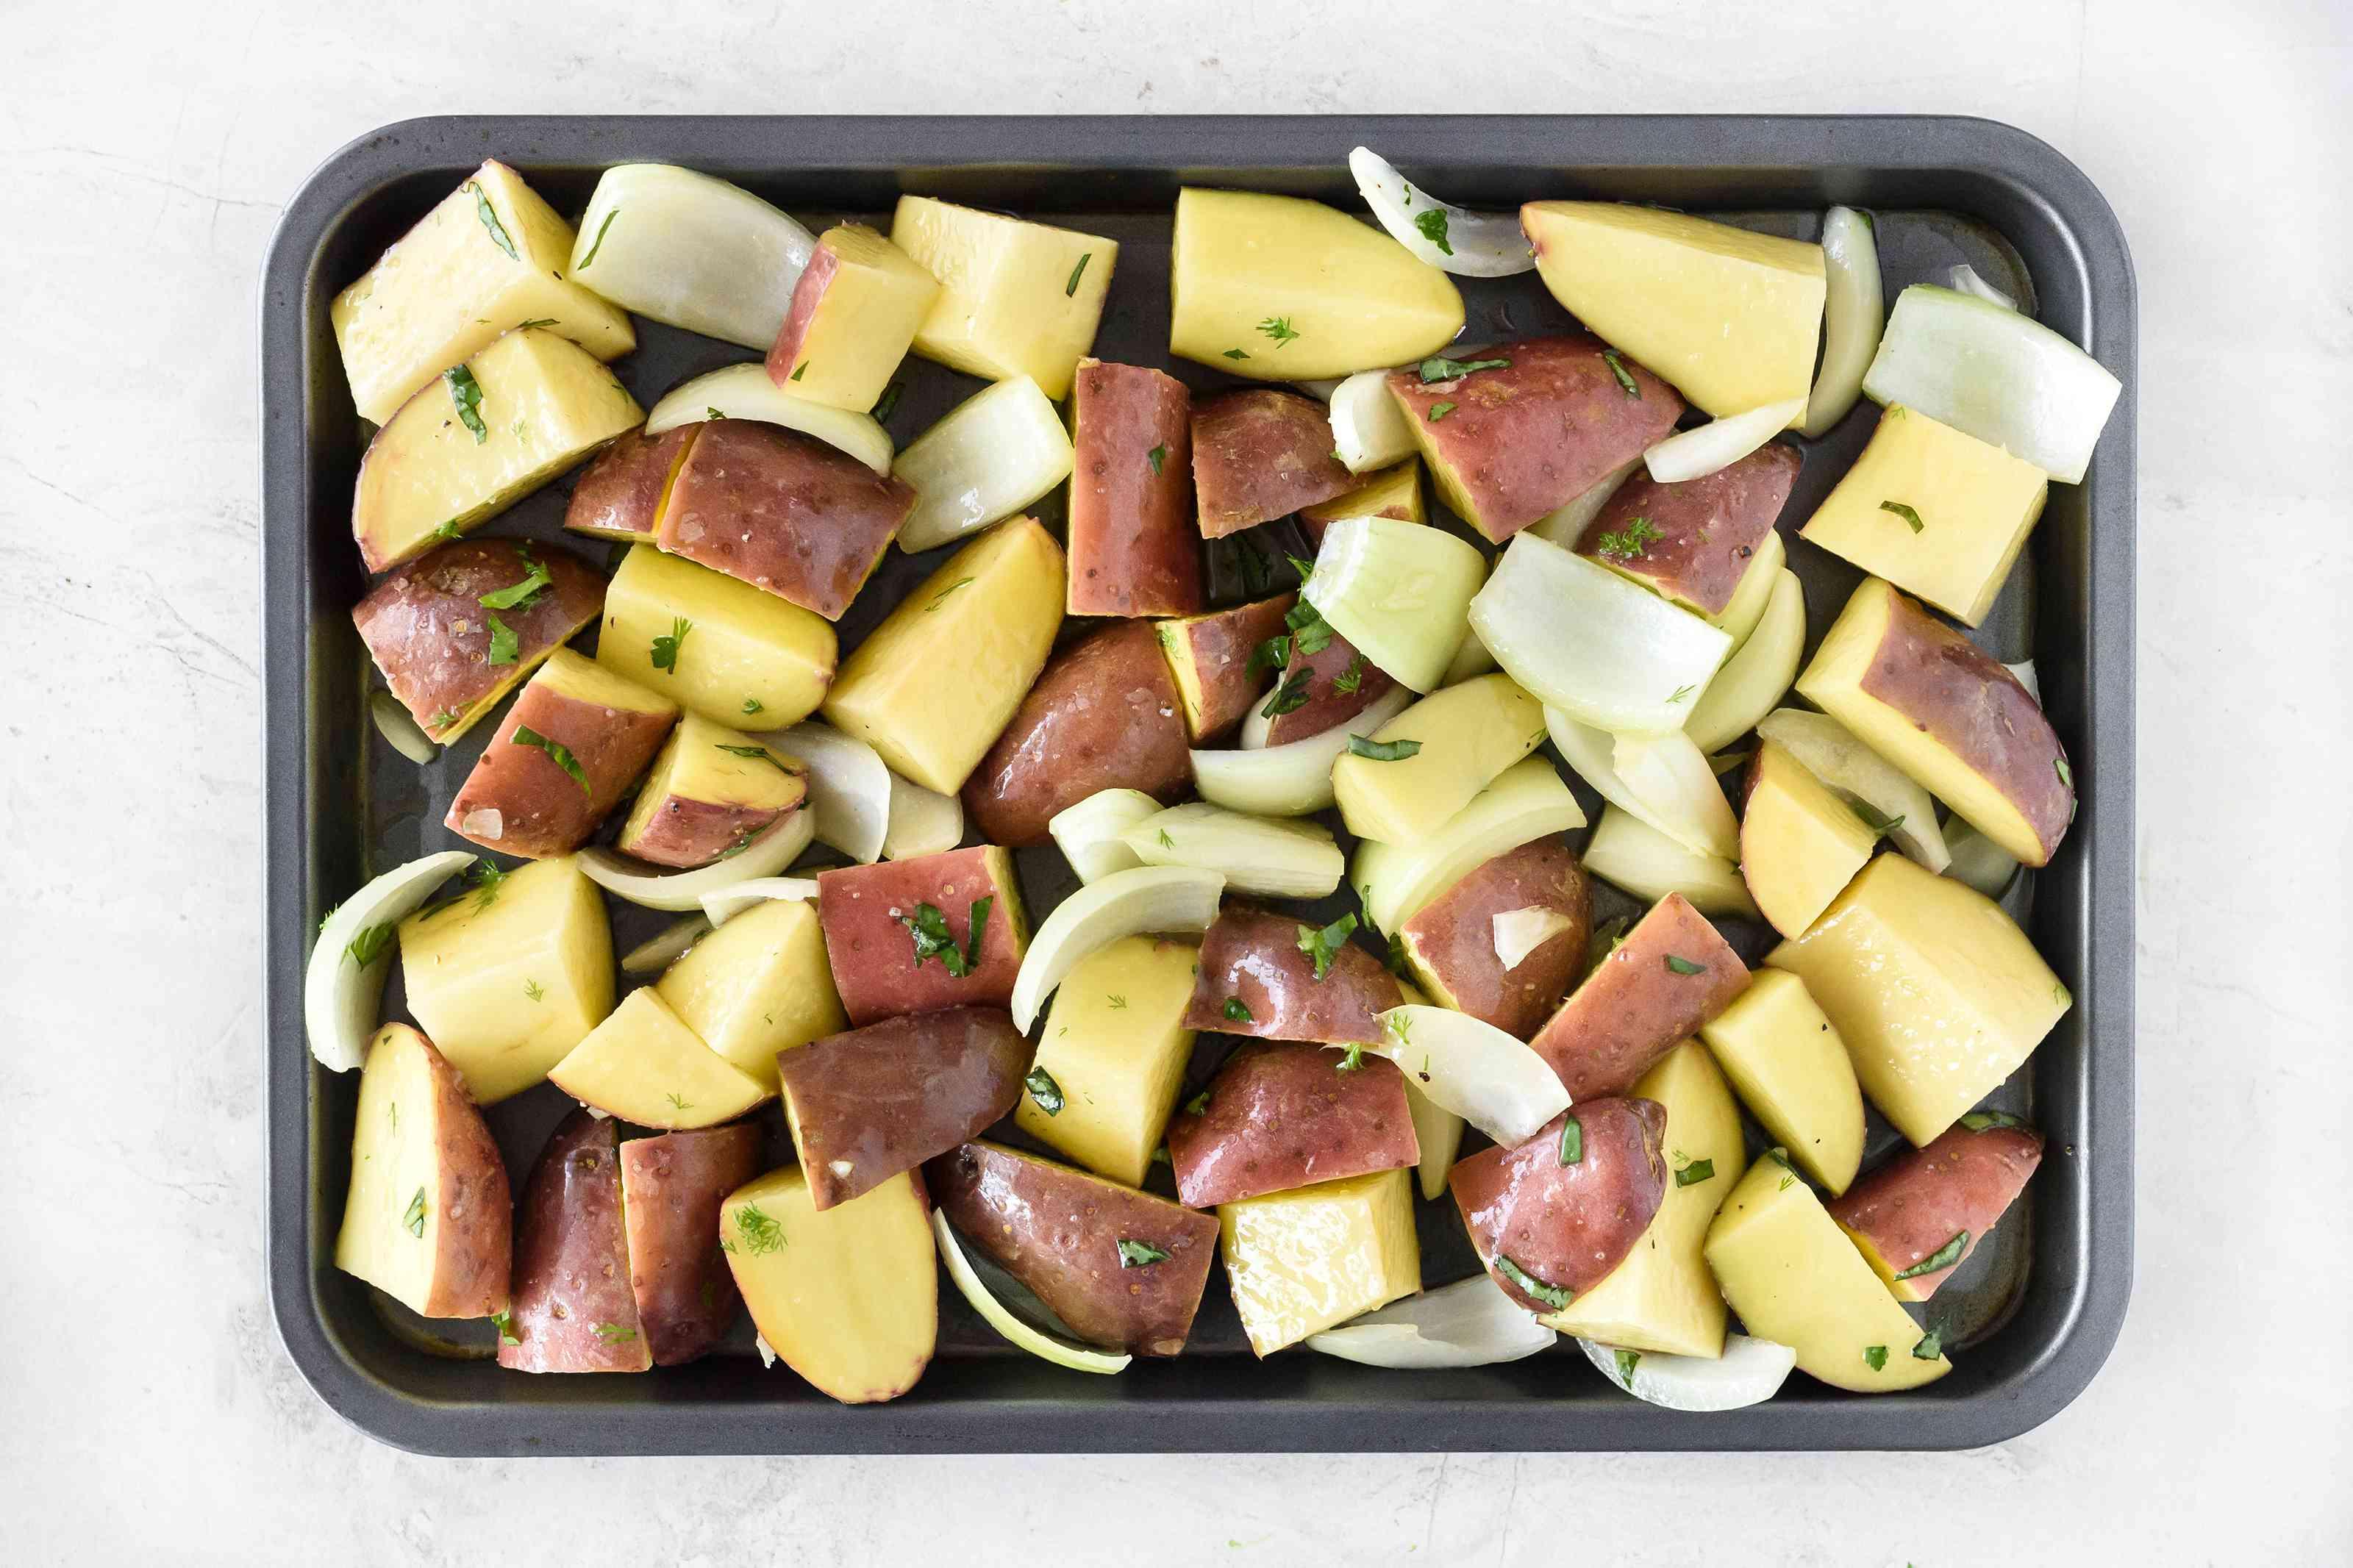 Transfer potatoes